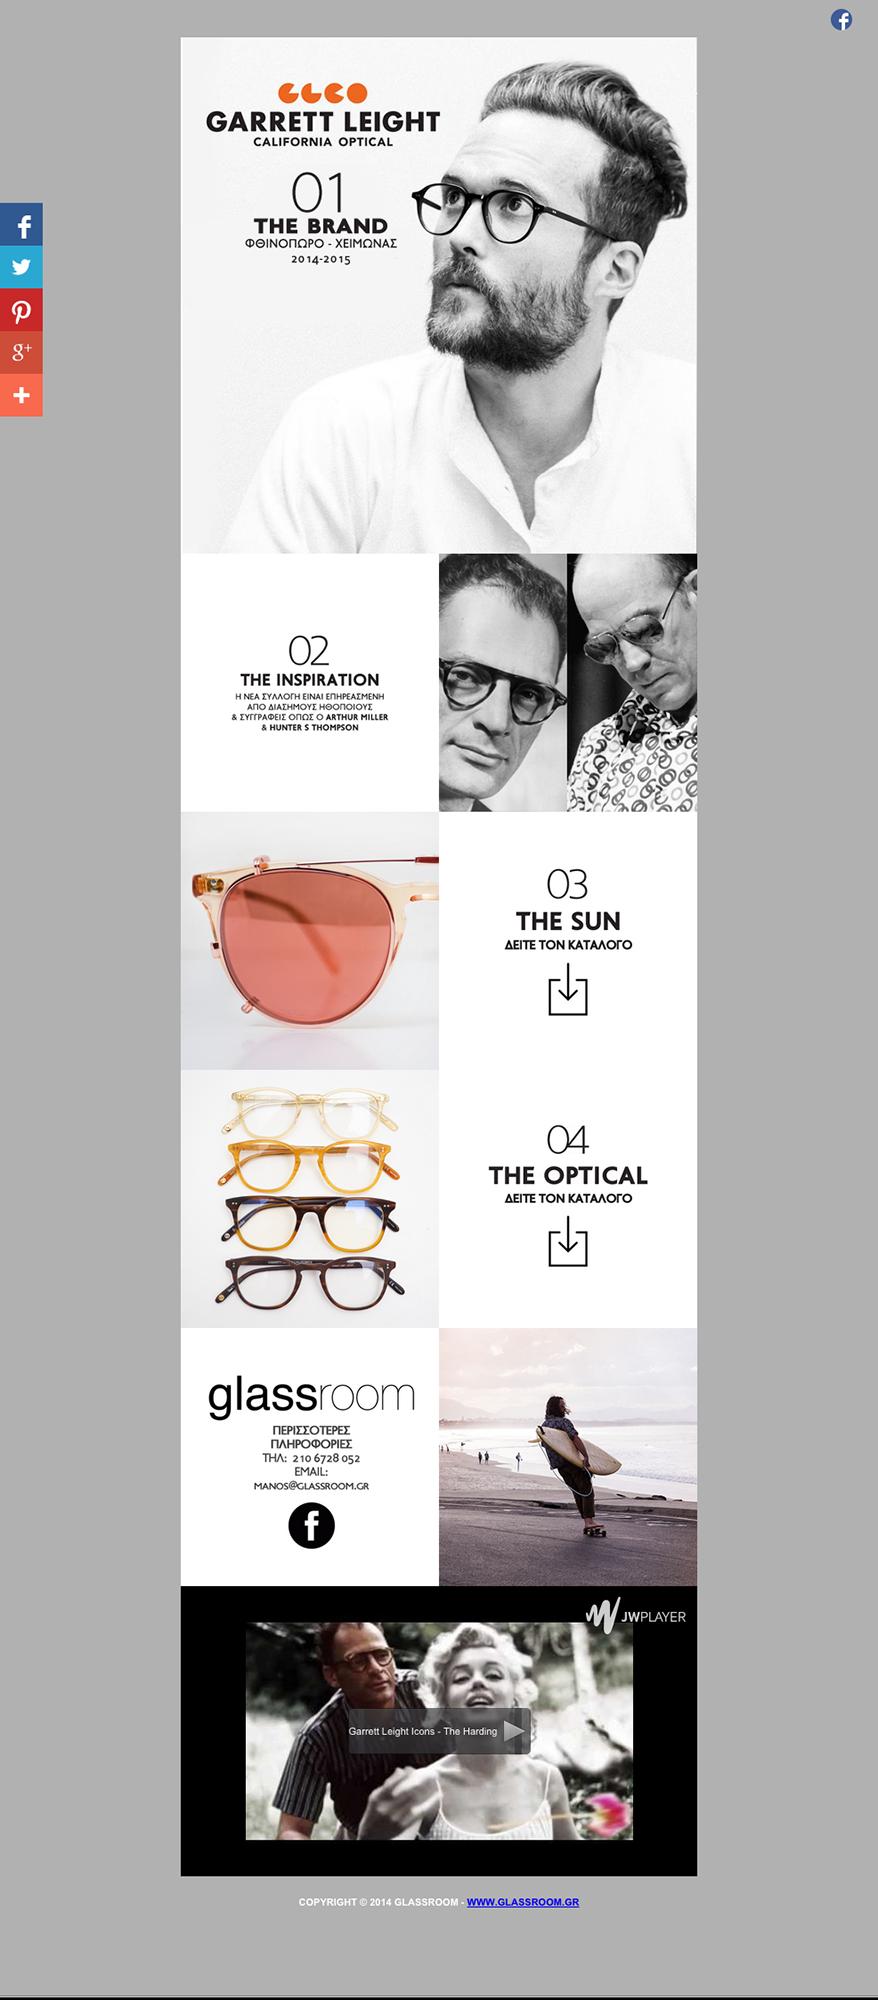 Glassroom Newletter No1 Garrett Leight California Optical  ➜ http://bit.ly/1sBF4dF